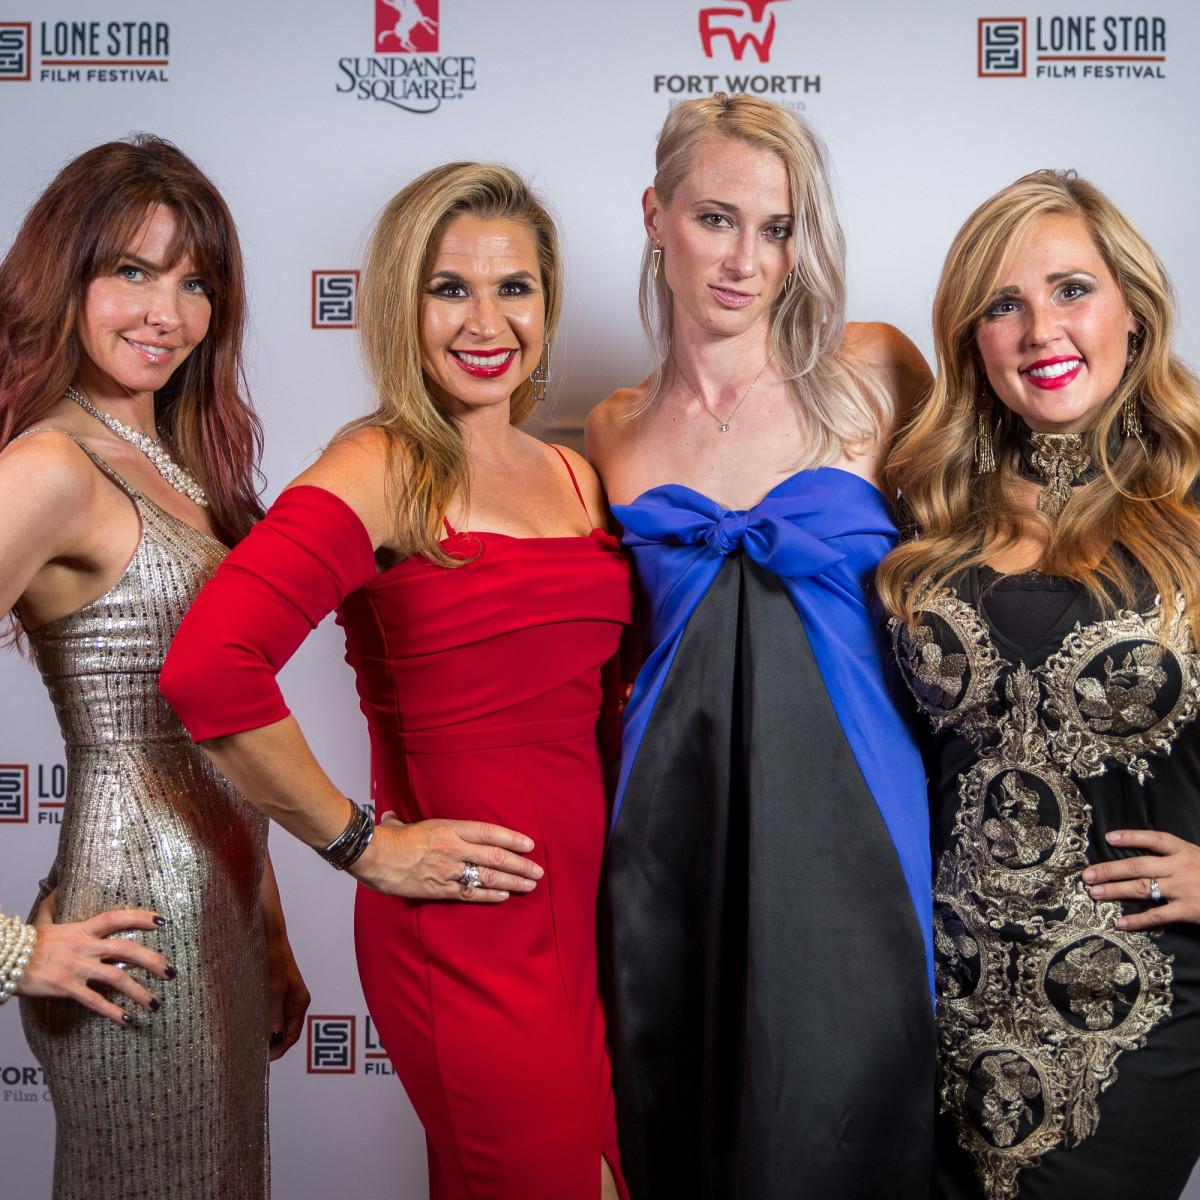 Alyson Powers, Amy Creager, Jessica Spawn, Stephanie Parker